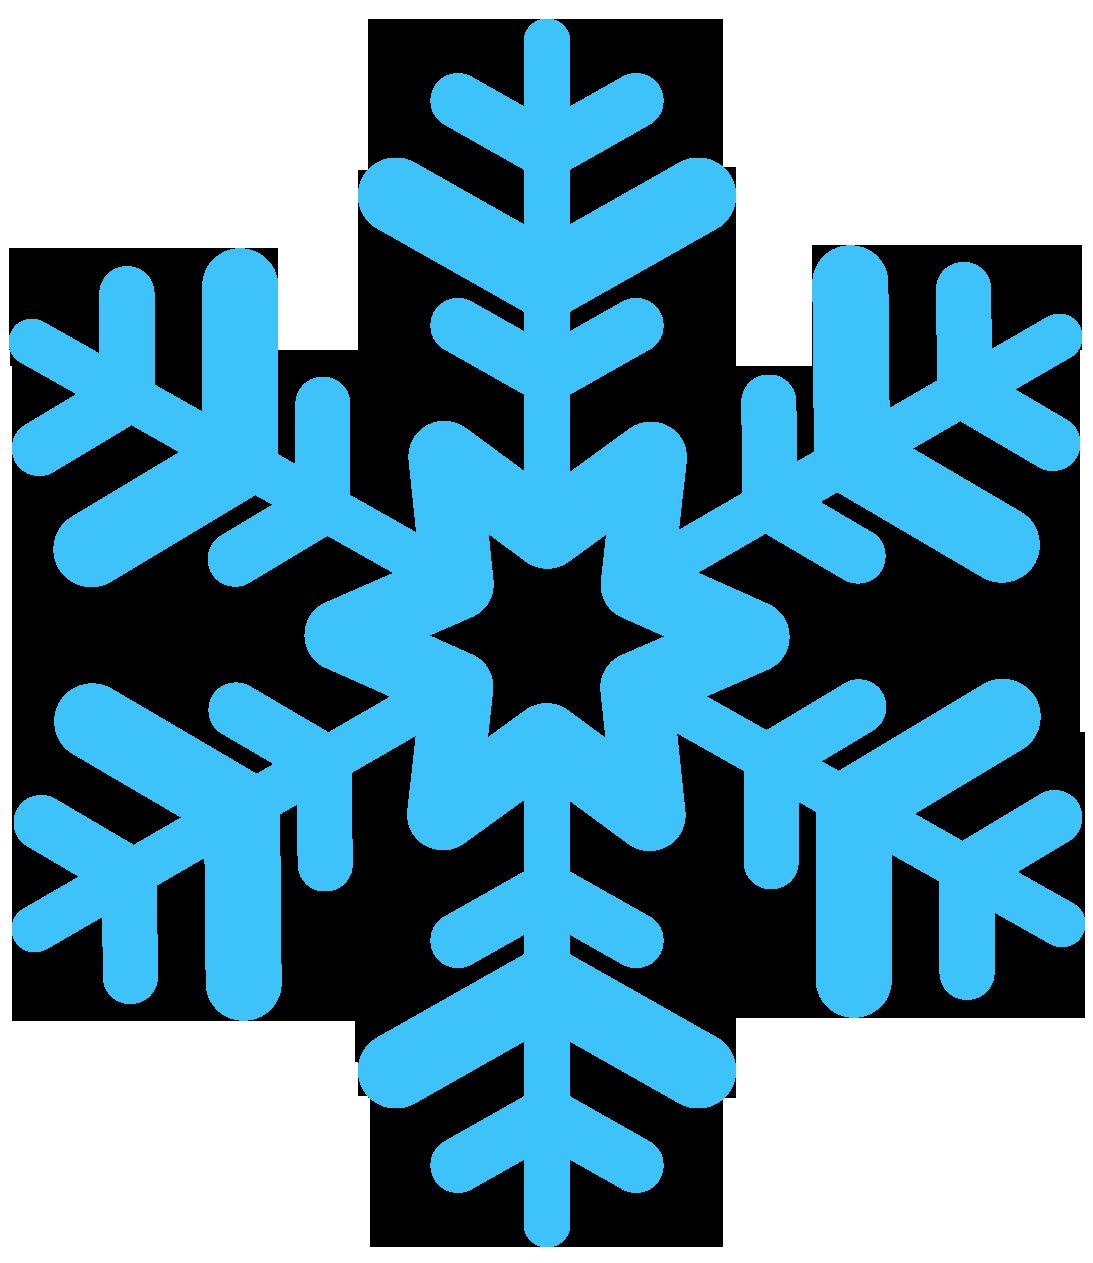 Cute snowflake clipart clip art free library DDoS Video for Holiday Fun clip art free library